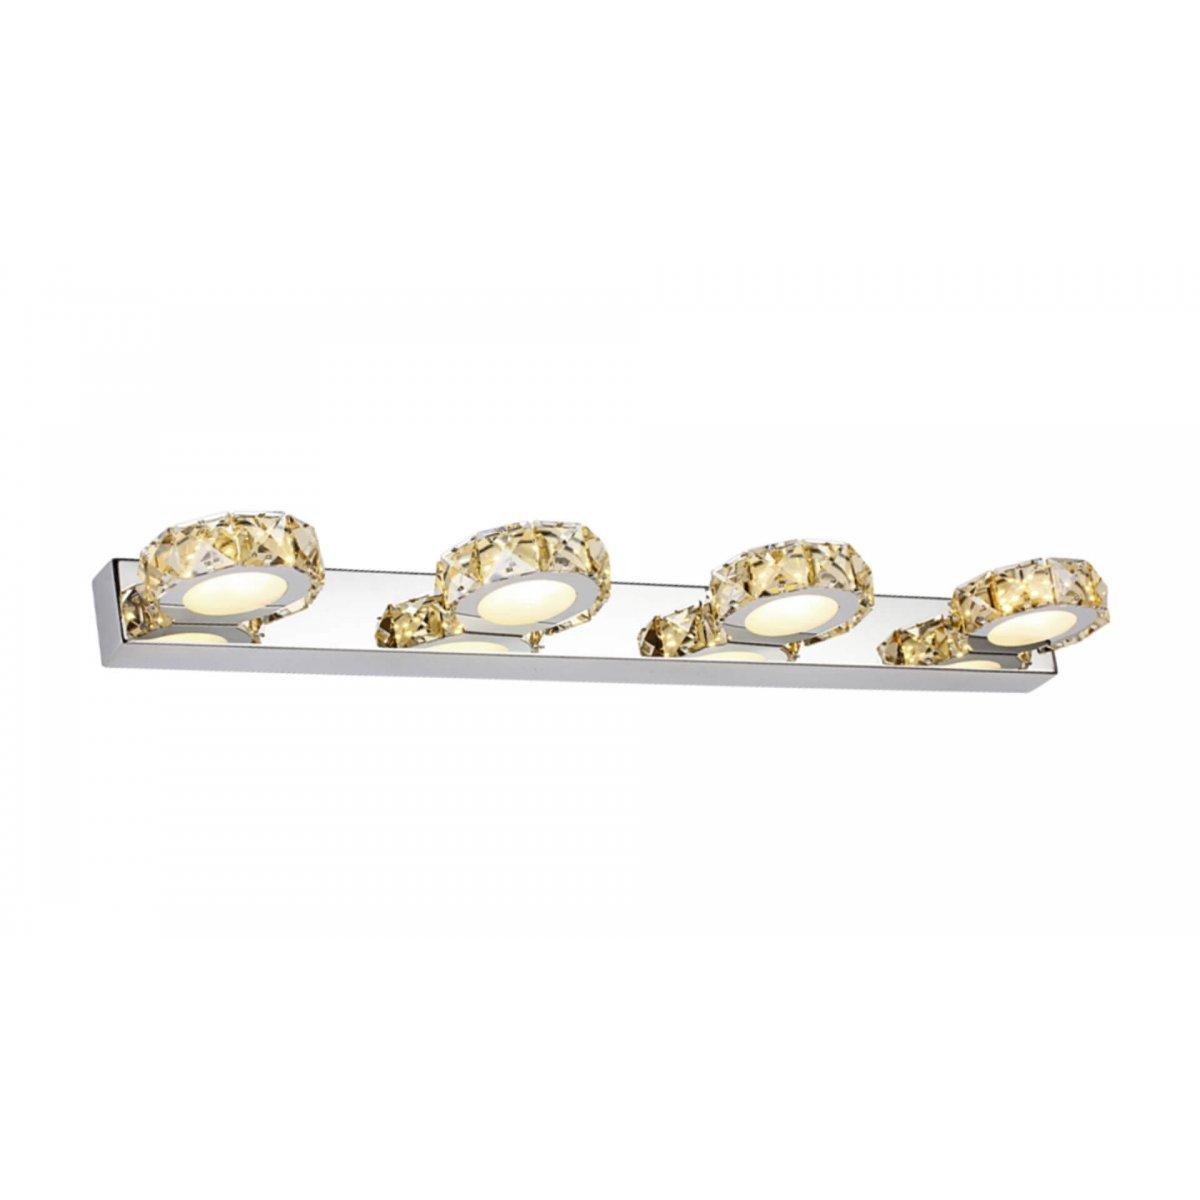 Aplică baie CHAMPAGNE gold & crom - Unique by Klausen